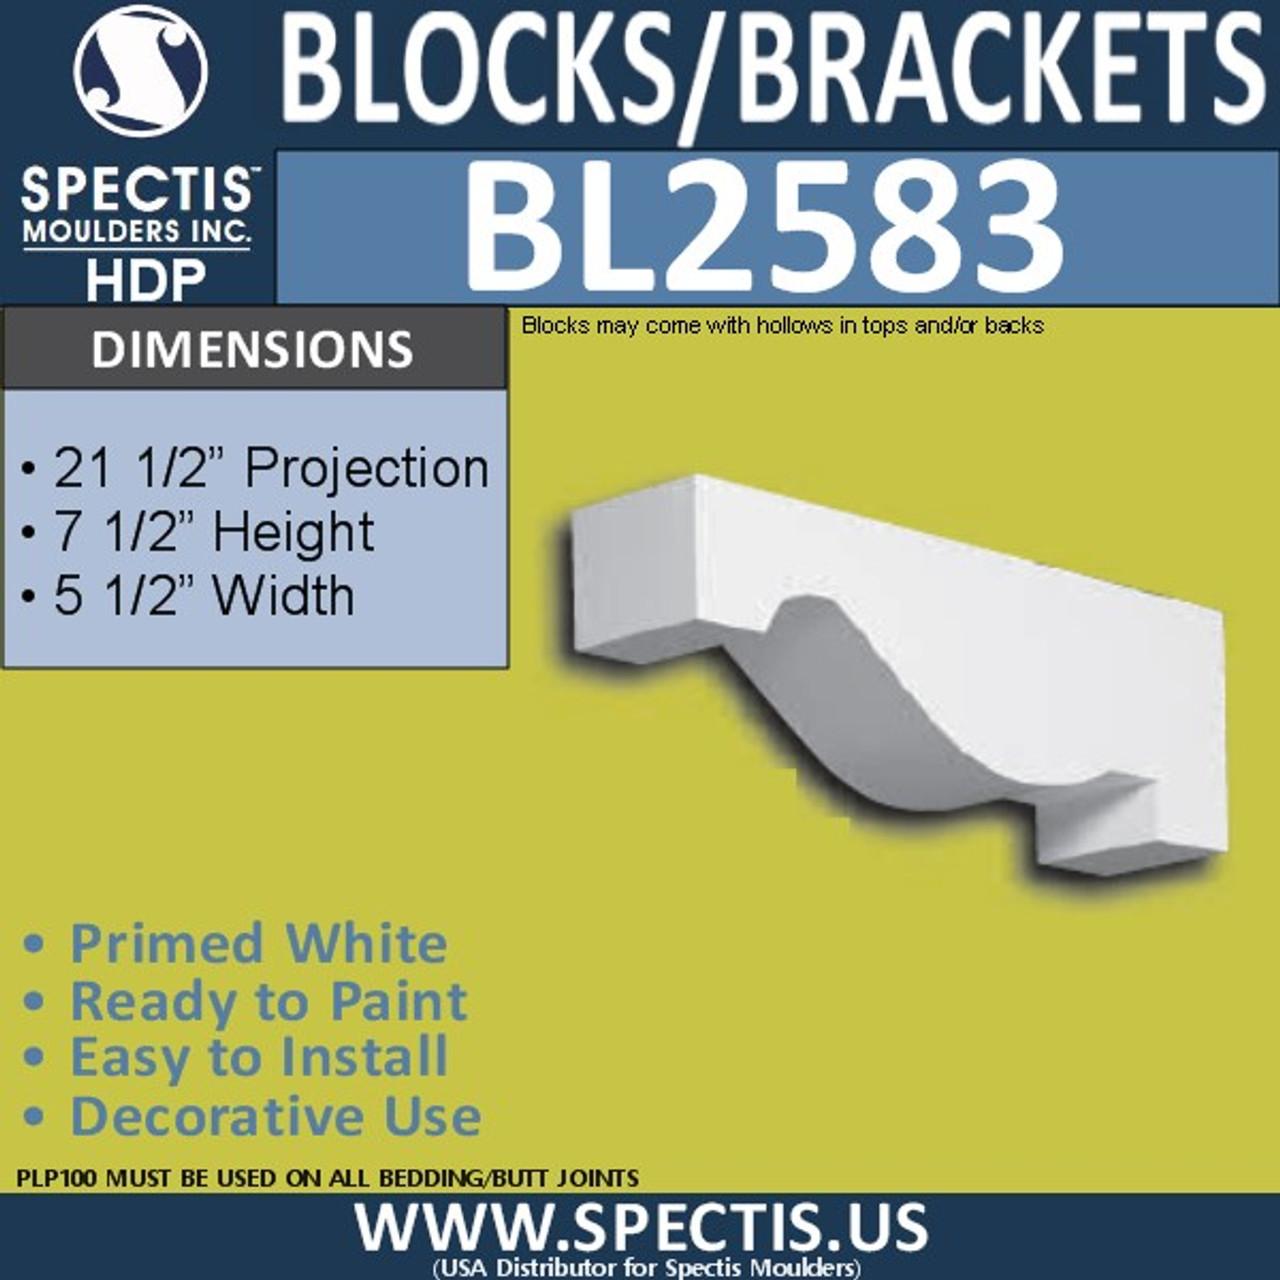 "BL2583 Eave Block or Bracket 5.5""W x 7.5""H x 21.5"" P"